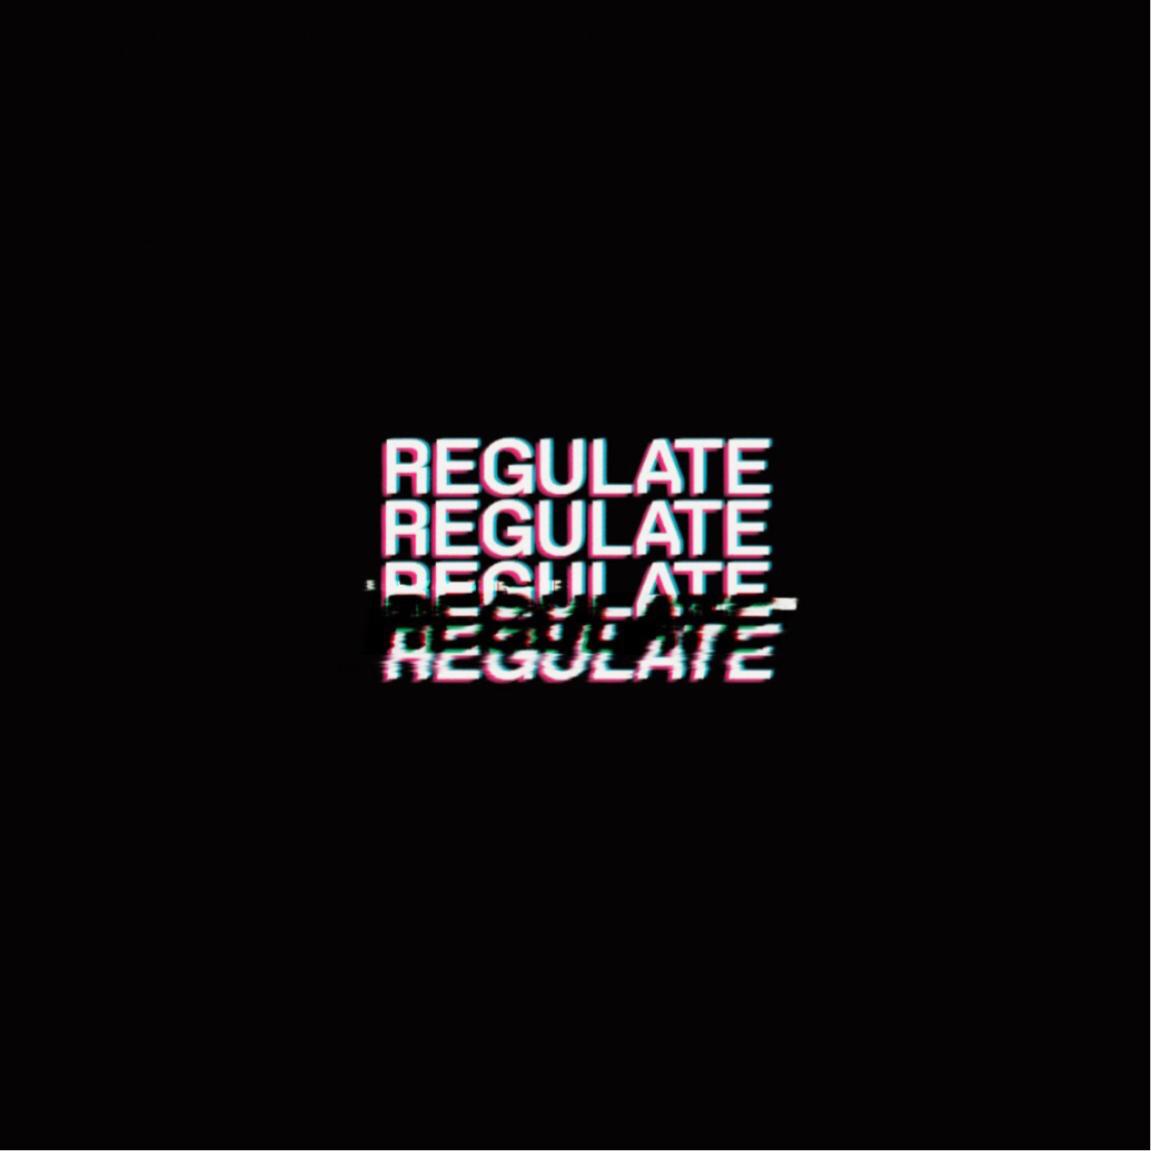 NCT 127 - Repackage Album Vol.1 [NCT #127 Regulate